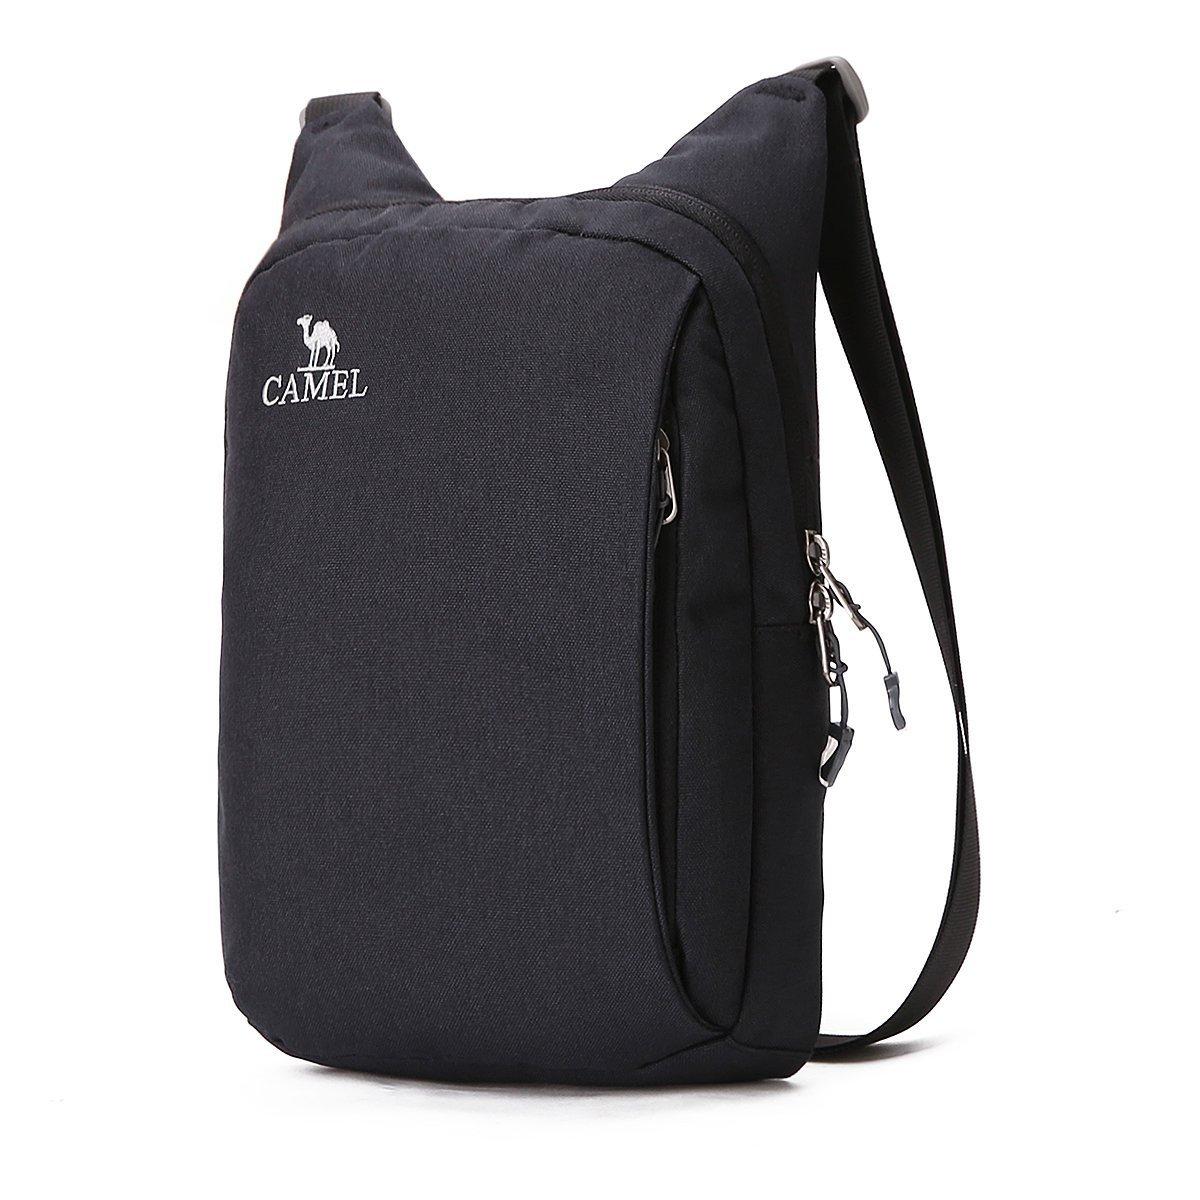 CAMEL CROWN Unisex Anti-Theft Crossbody Bag Lightweight Mens Shoulder Bag Women Outdoor Mini satchel(Black)